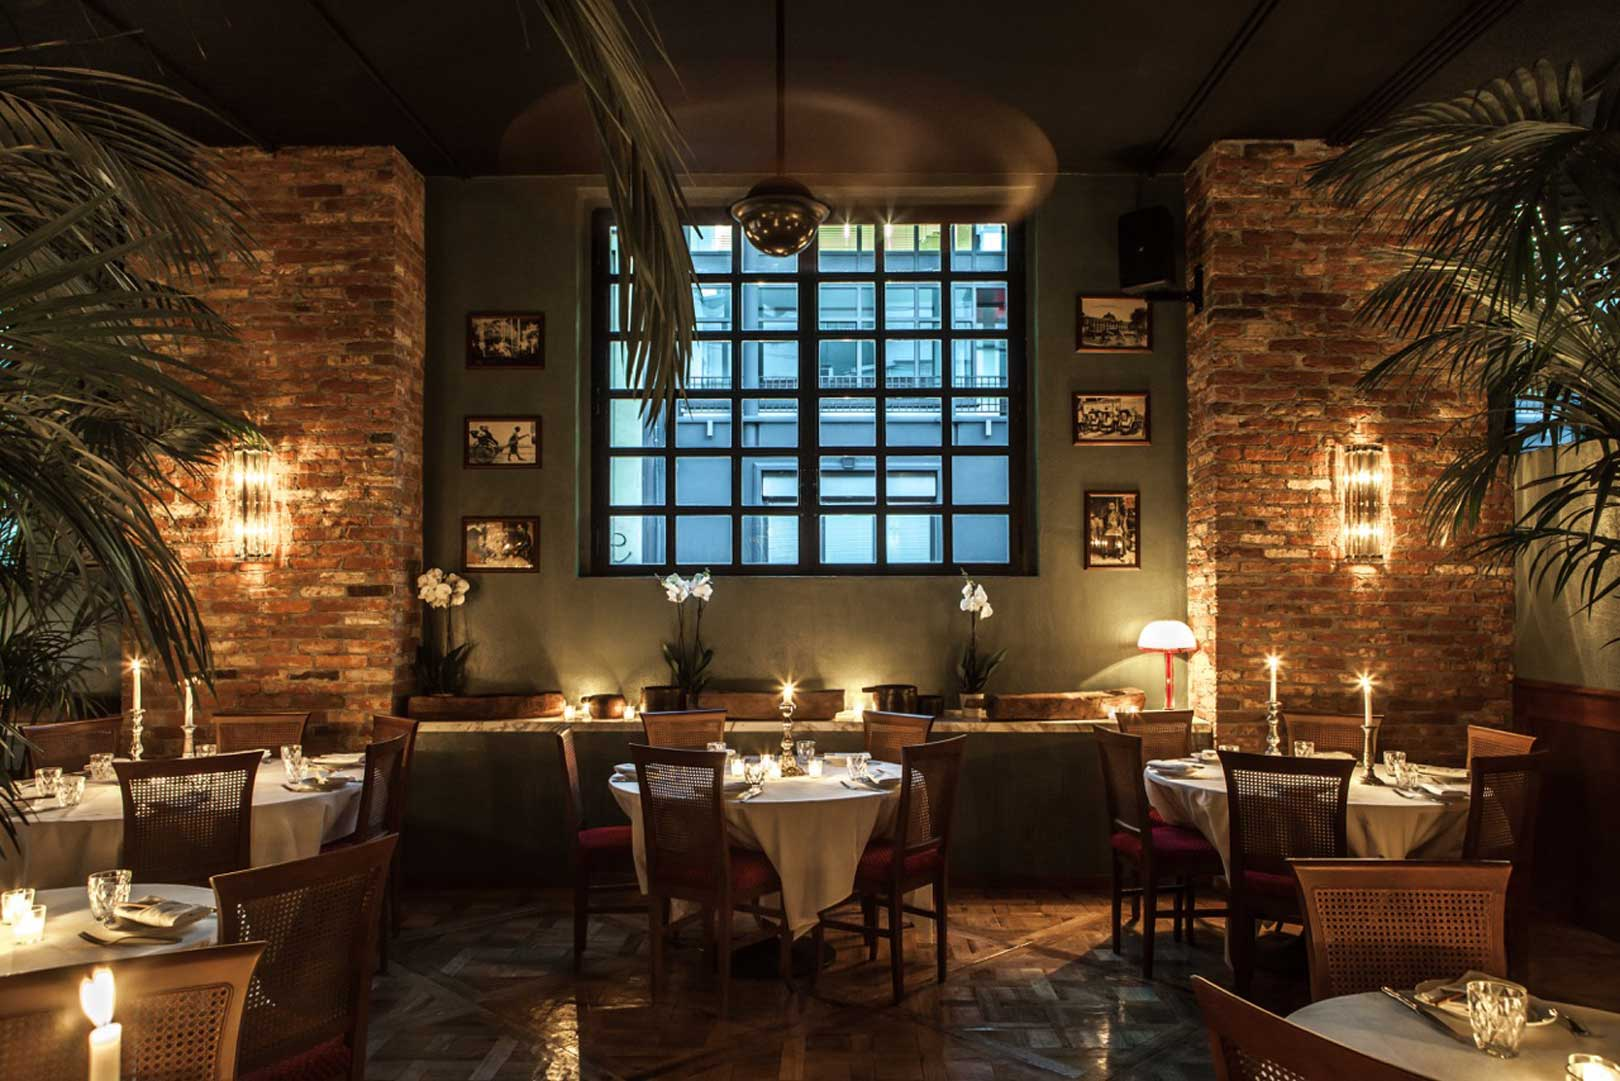 10 ristoranti industrial chic - Saigon